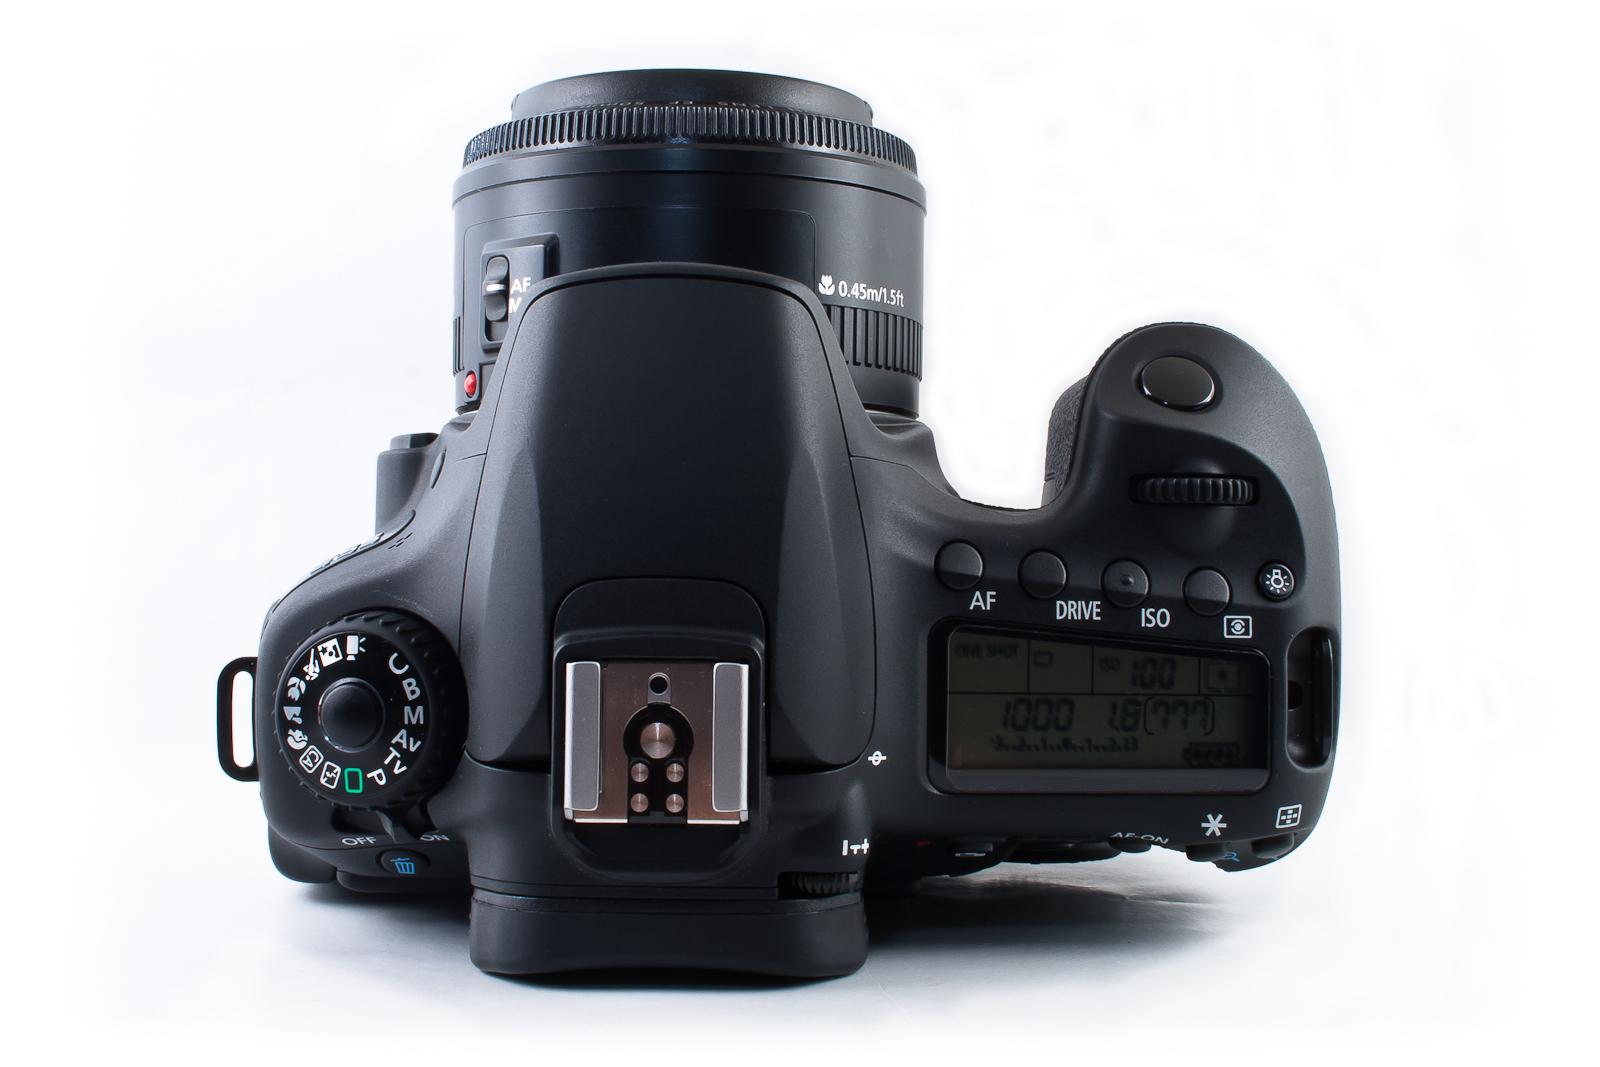 Canon_60D_Top_View.jpg